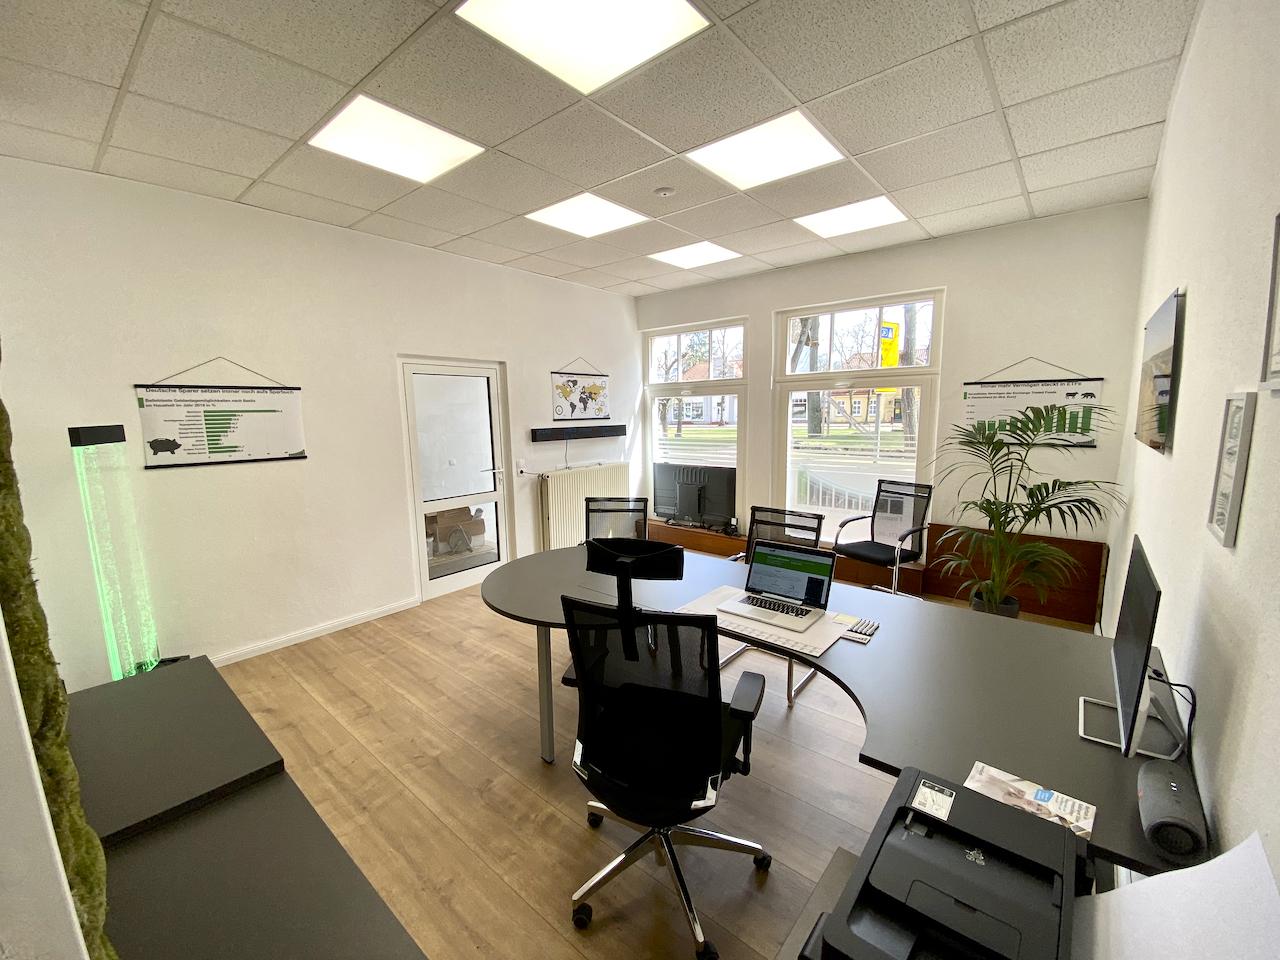 Büro in Lübtheen für Kredit